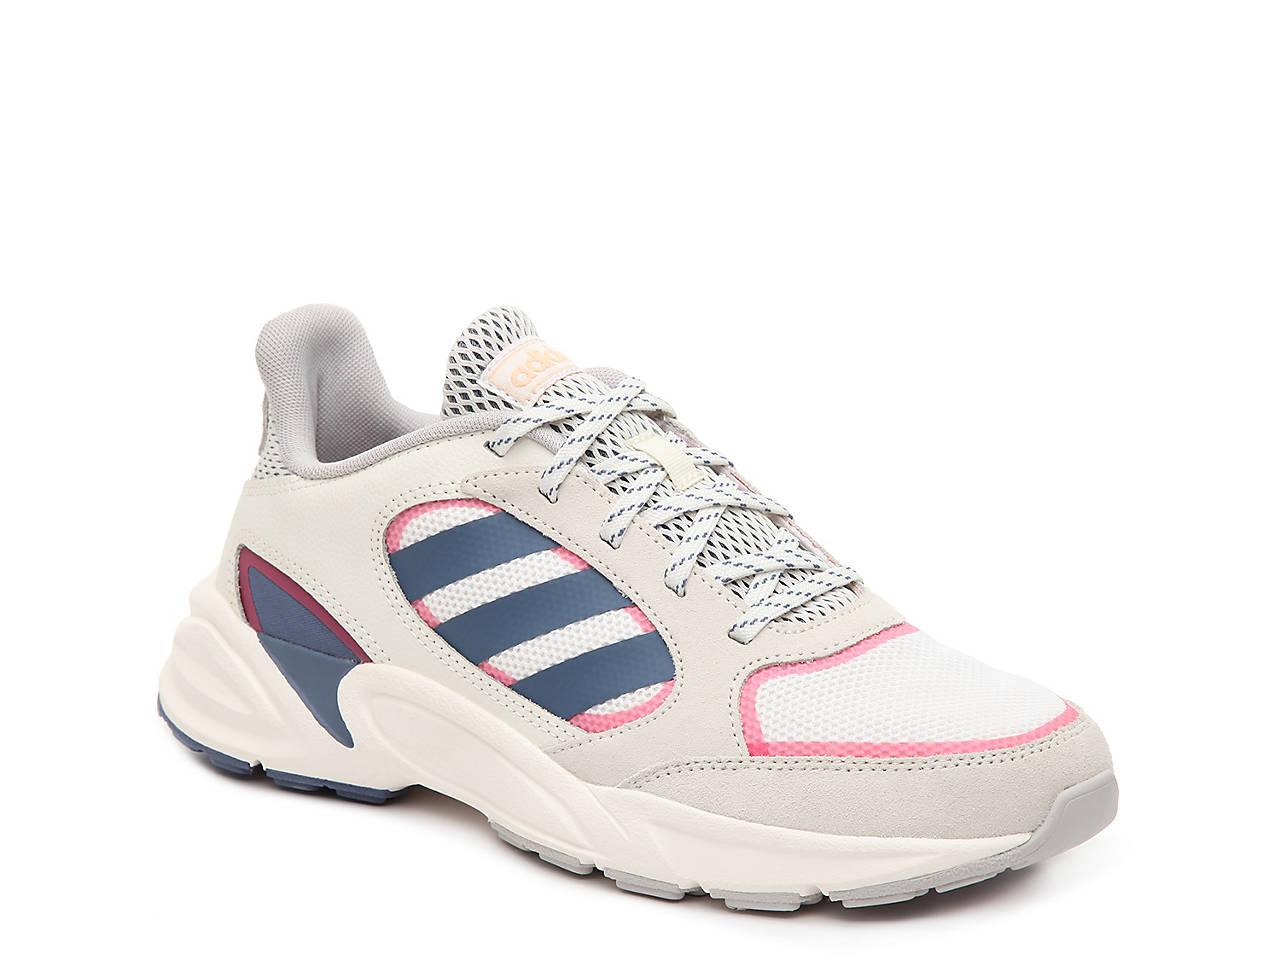 6093eacc3 adidas 90S Valasion Sneaker - Women's Women's Shoes | DSW